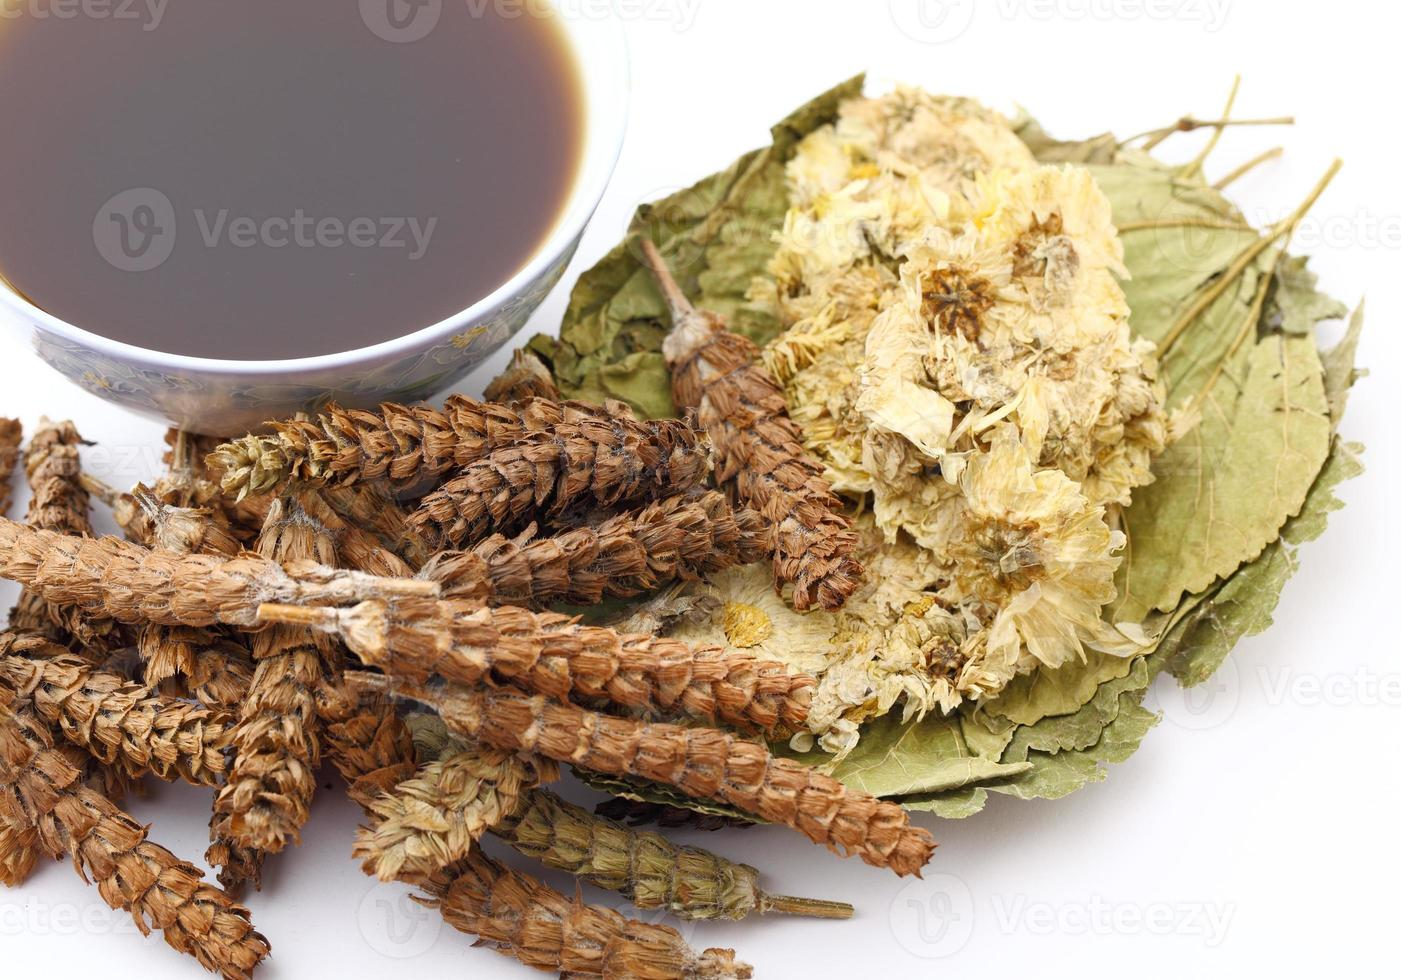 chinois médecine traditionnelle herbes boisson photo